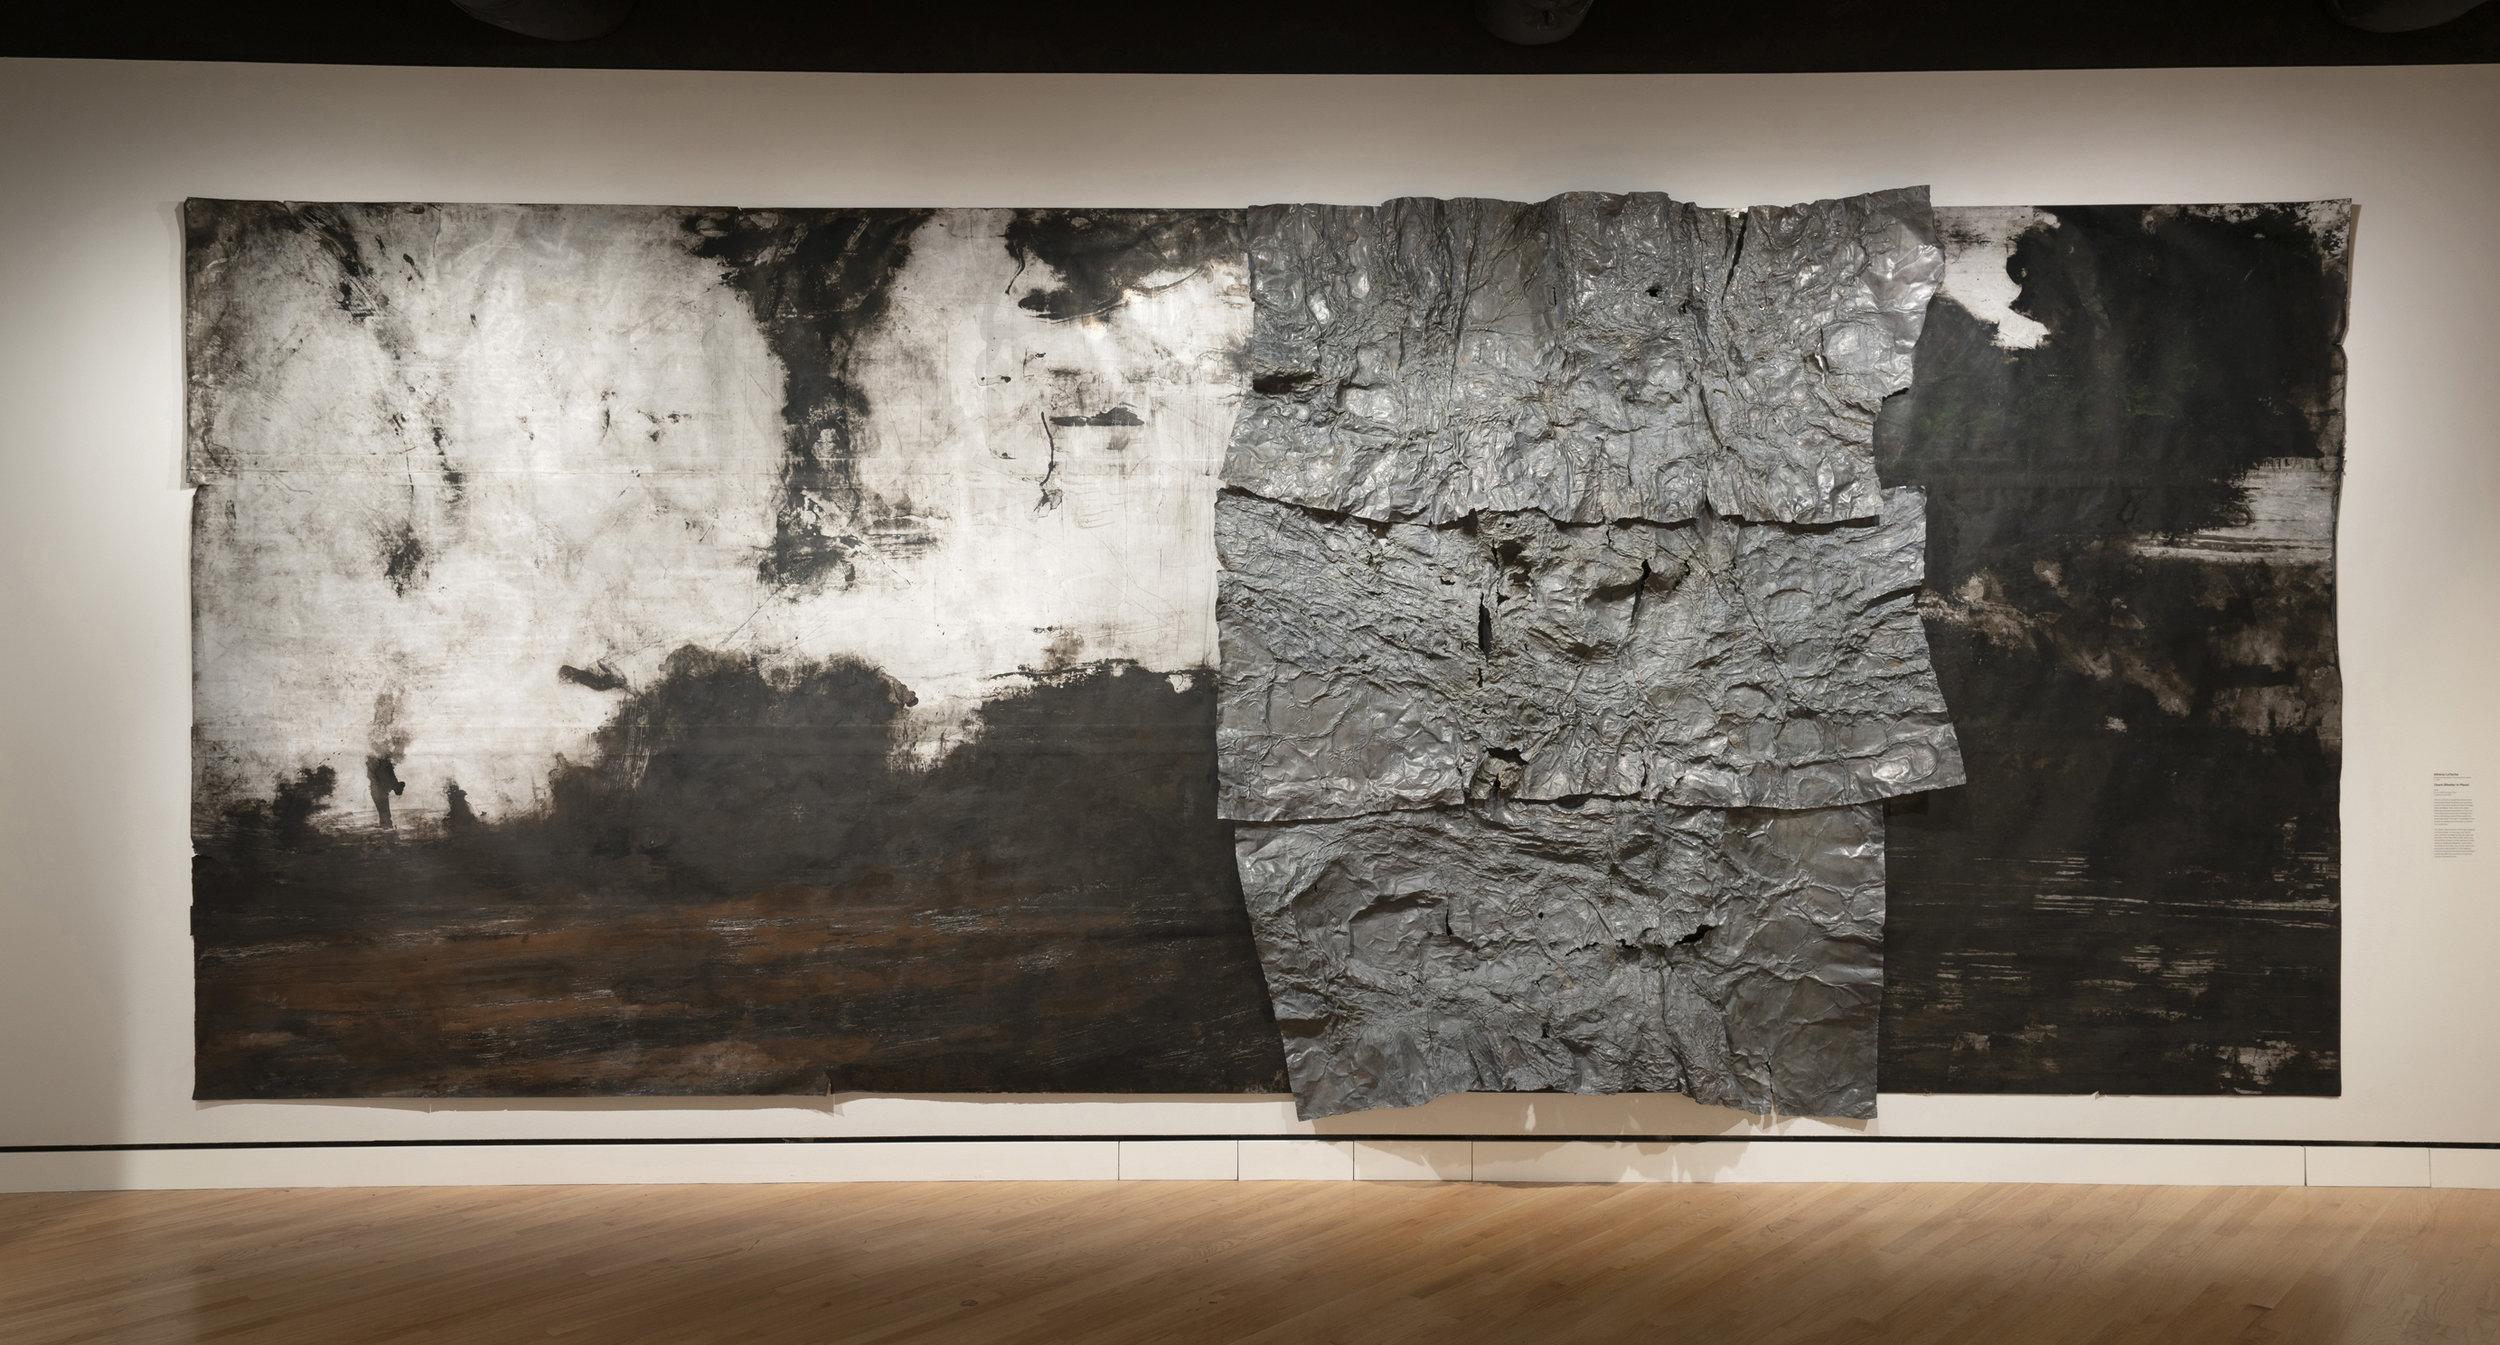 Athena LaTocha, installation view, The Crystal Bridges Museum of Art, Bentonville, AK, 2018